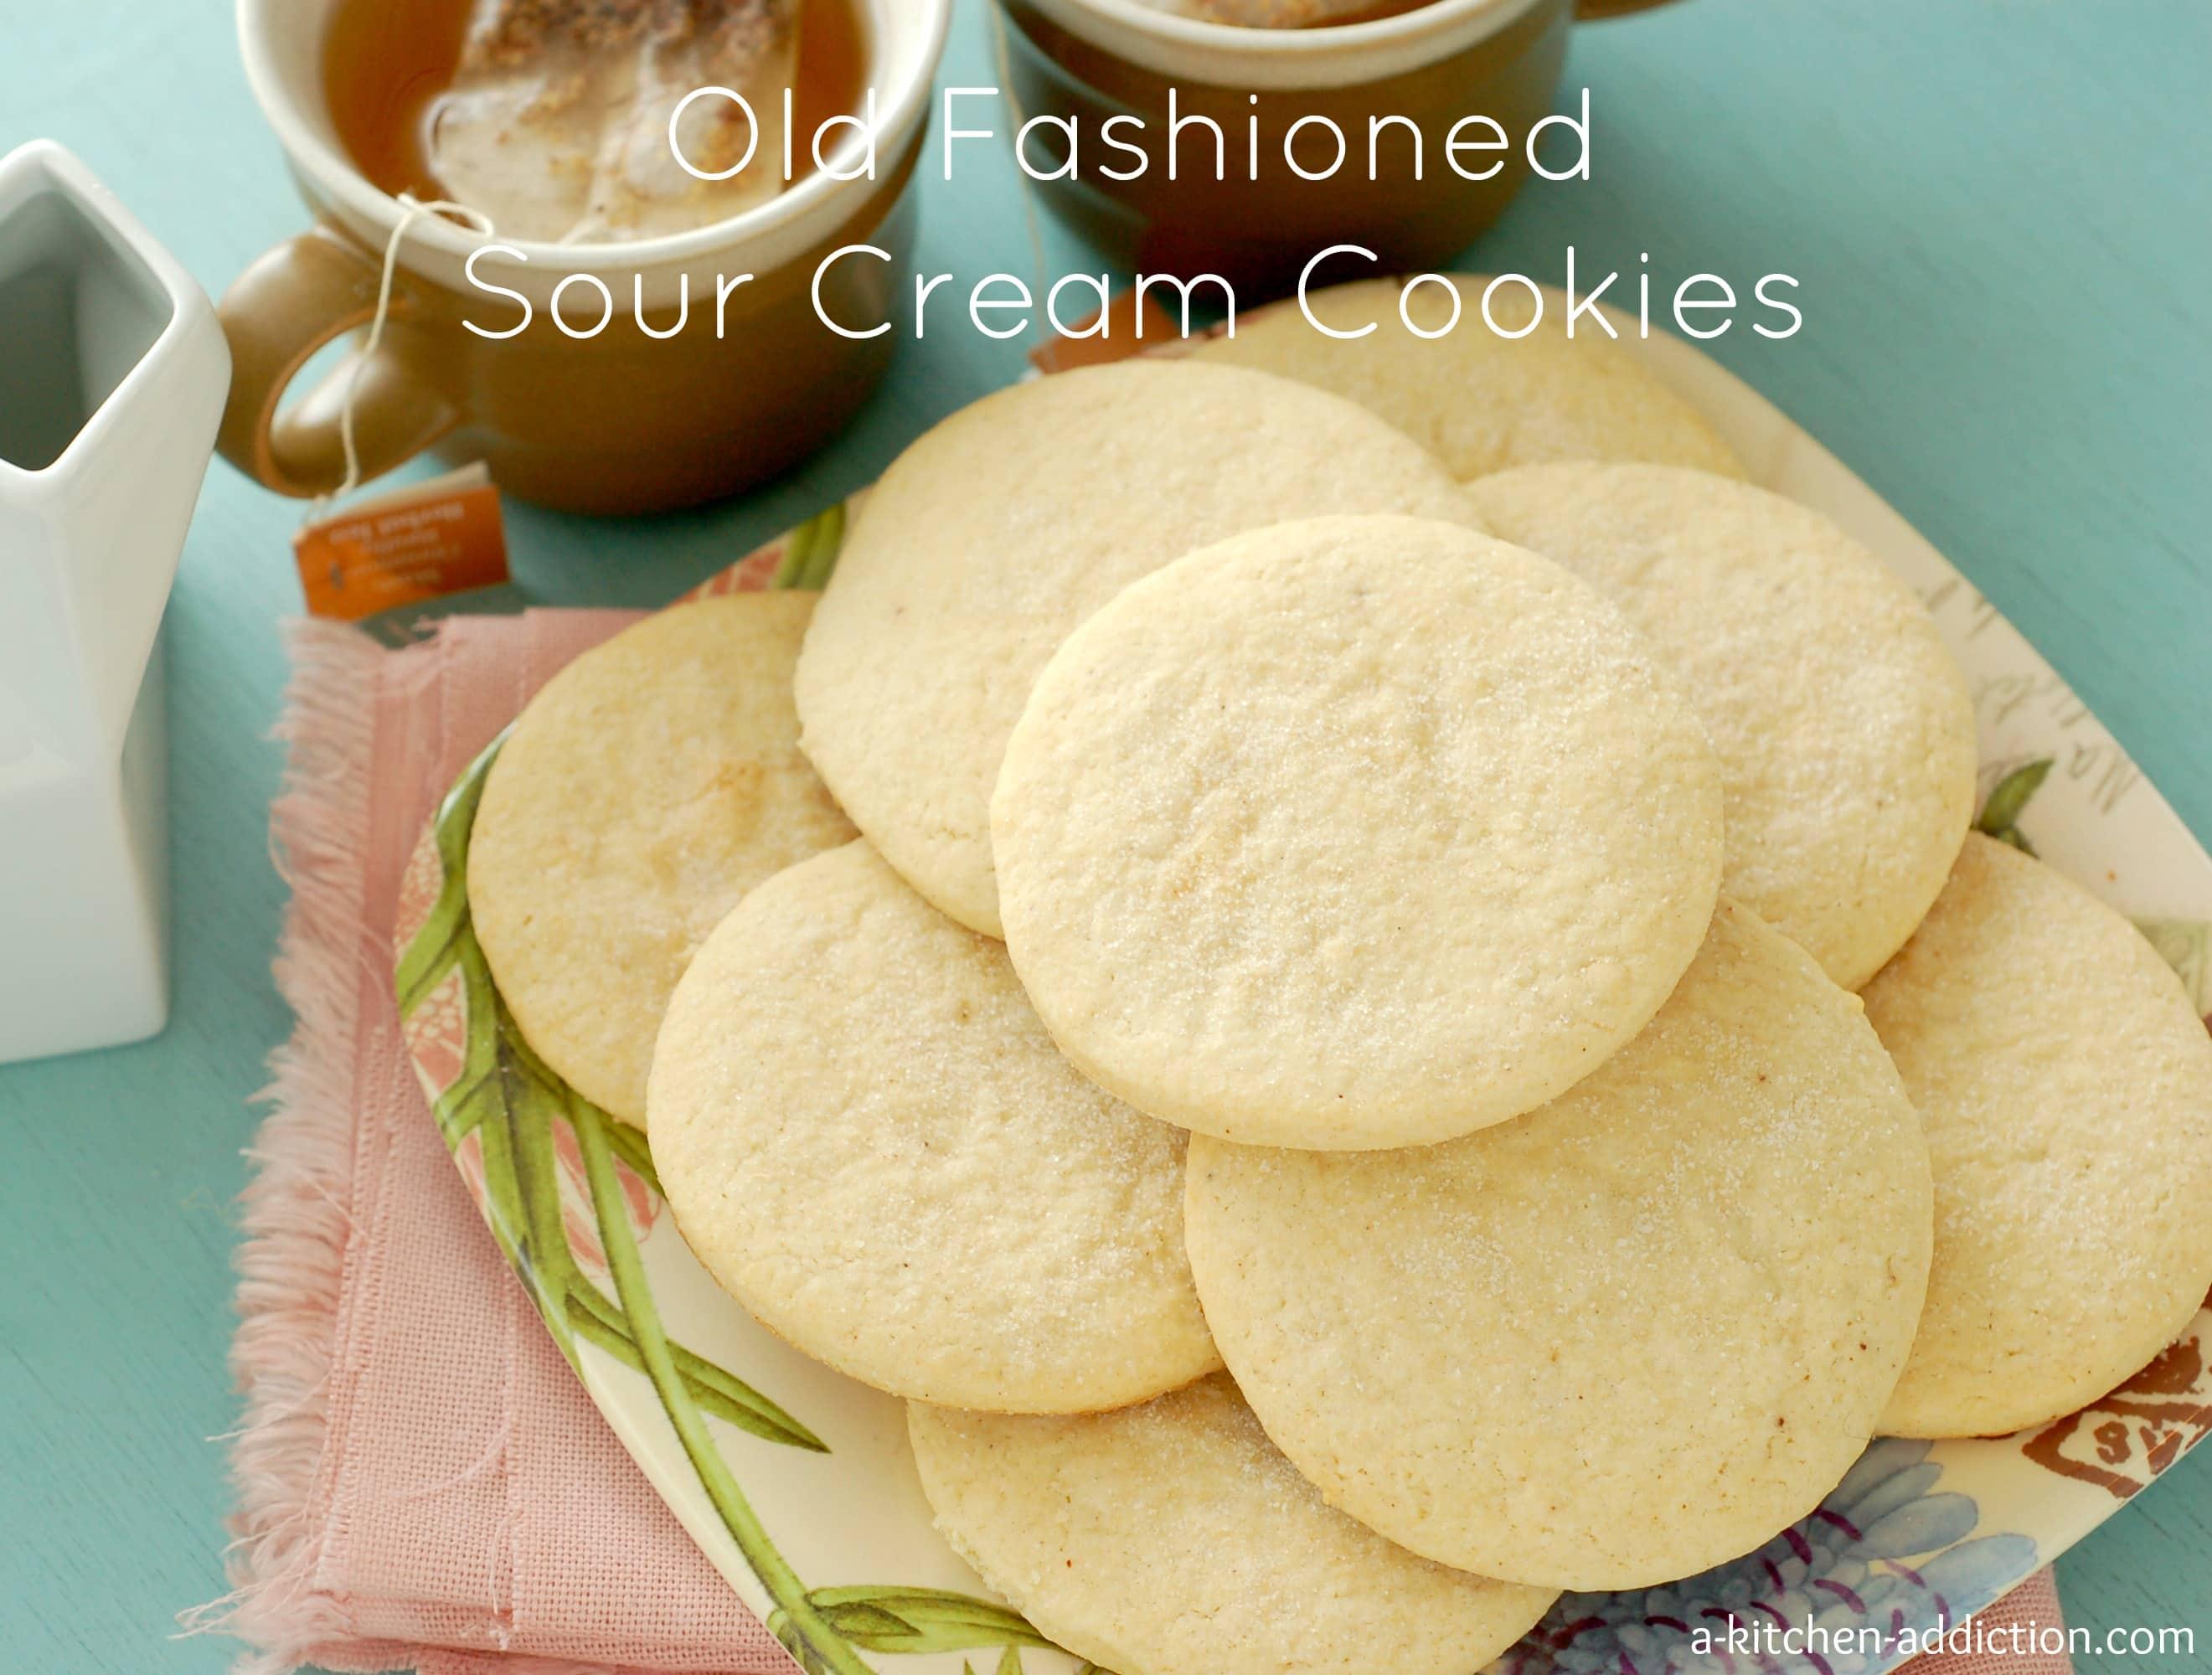 Betty Crocker Old Fashioned Sour Cream Sugar Cookies